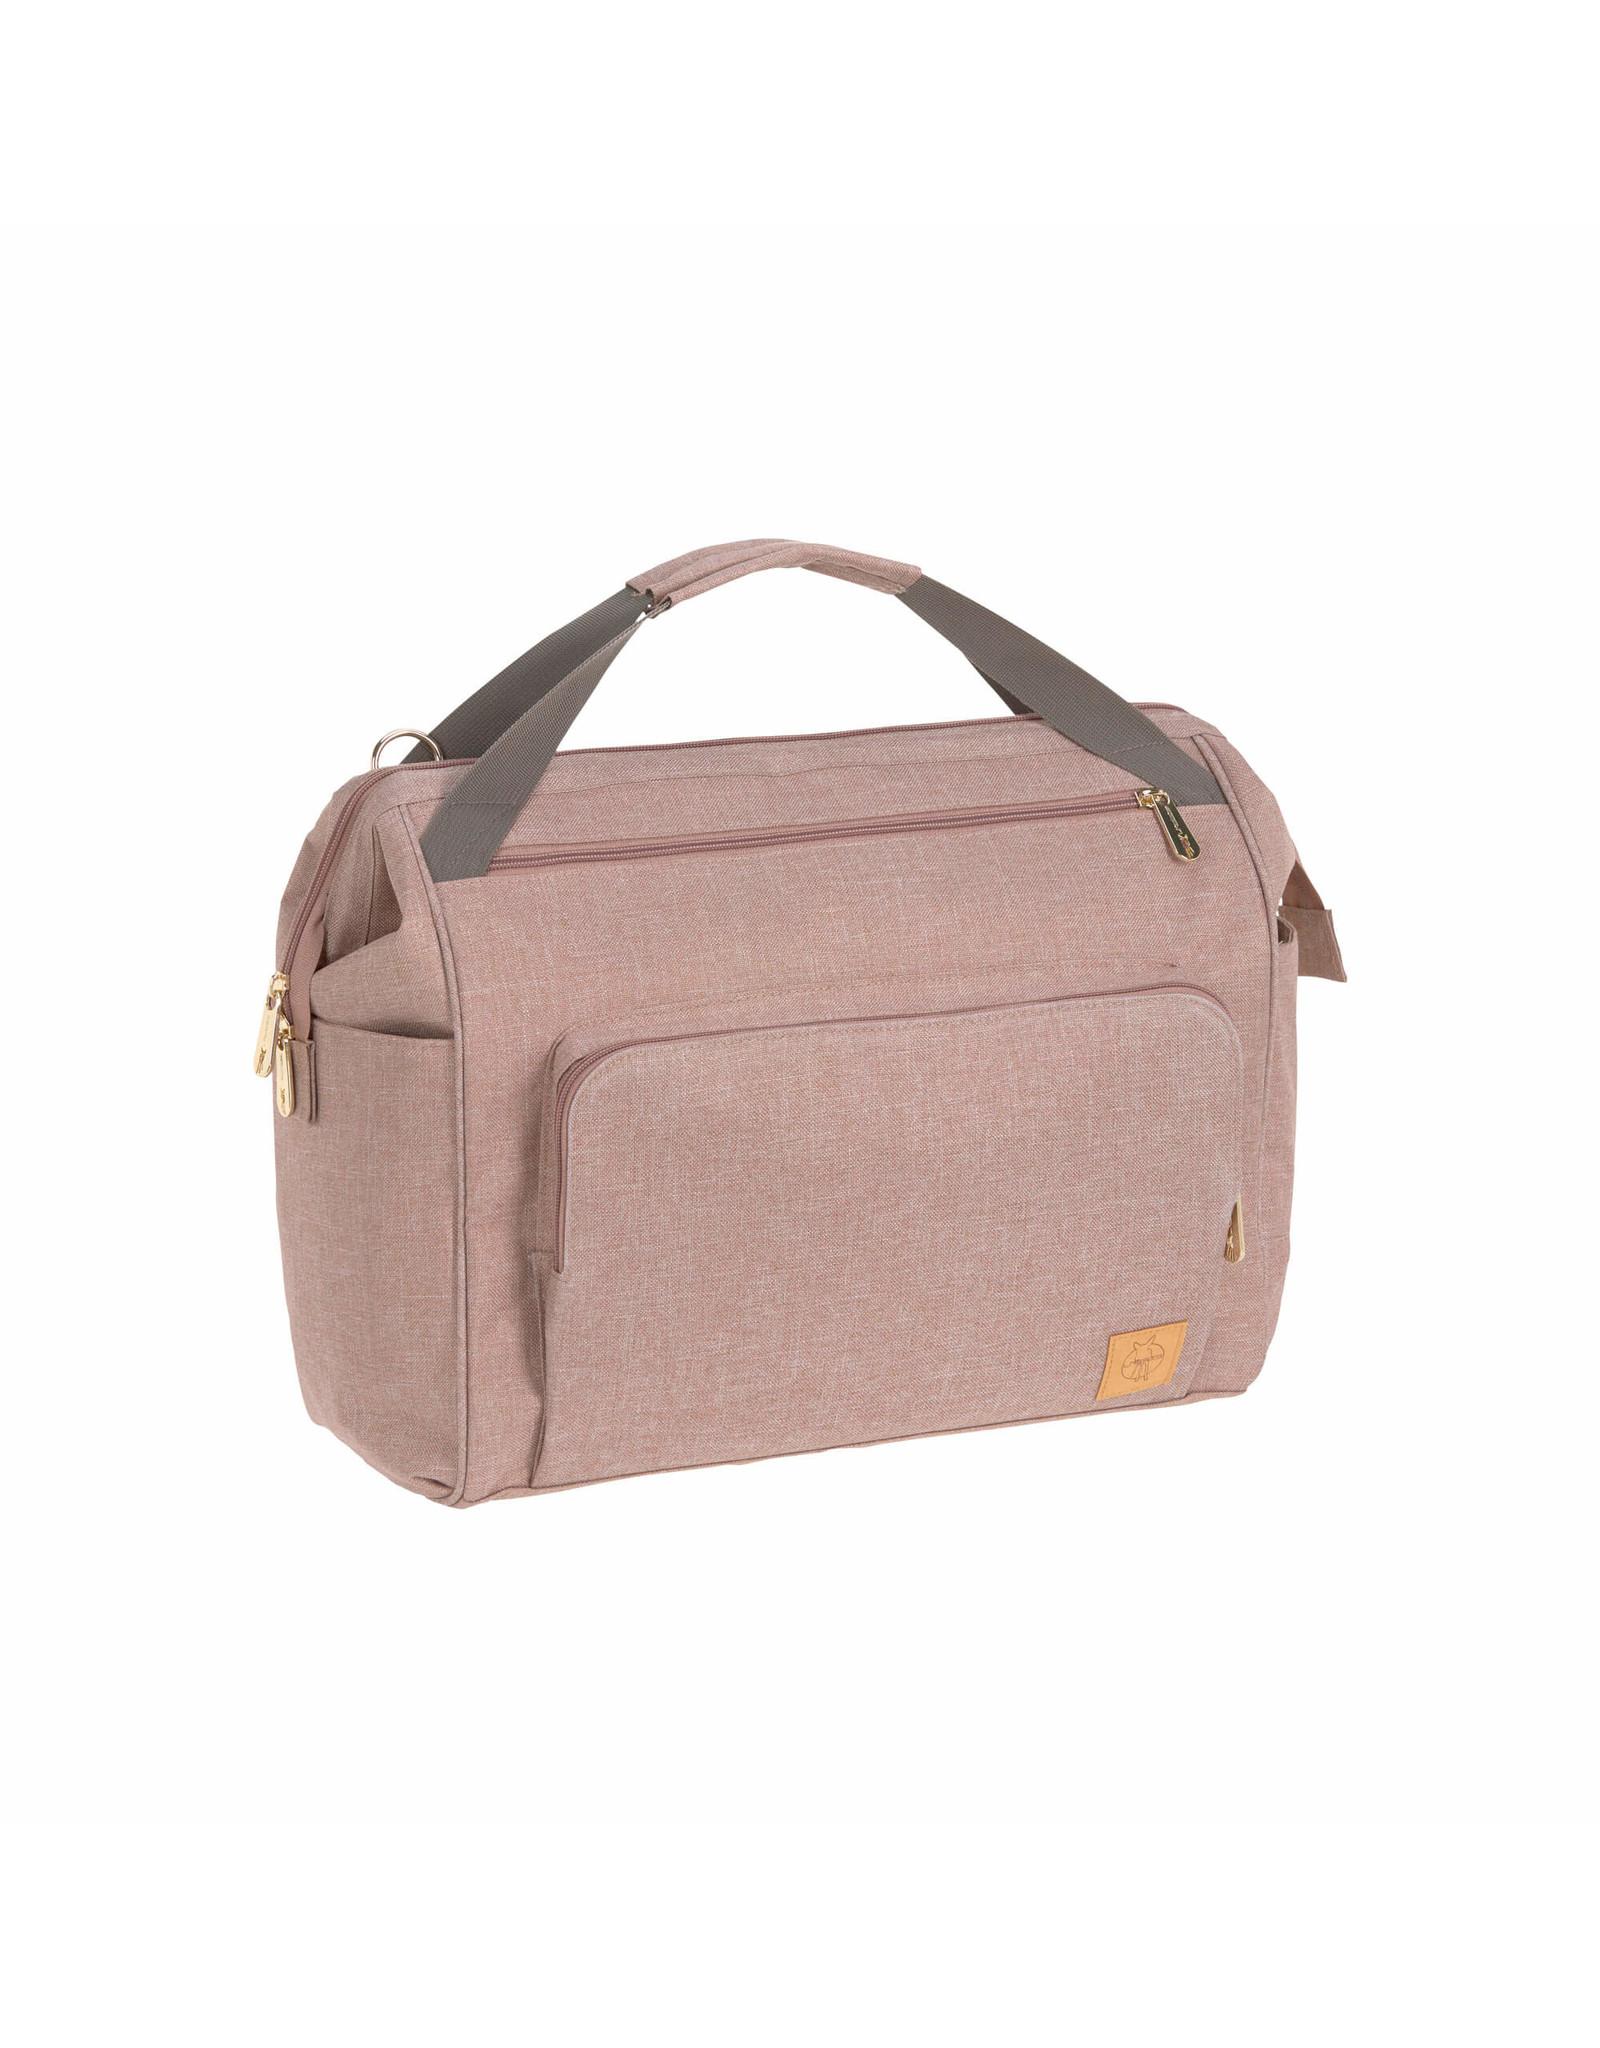 Lassig Lassig Glam Goldie Twin Backpack Rose